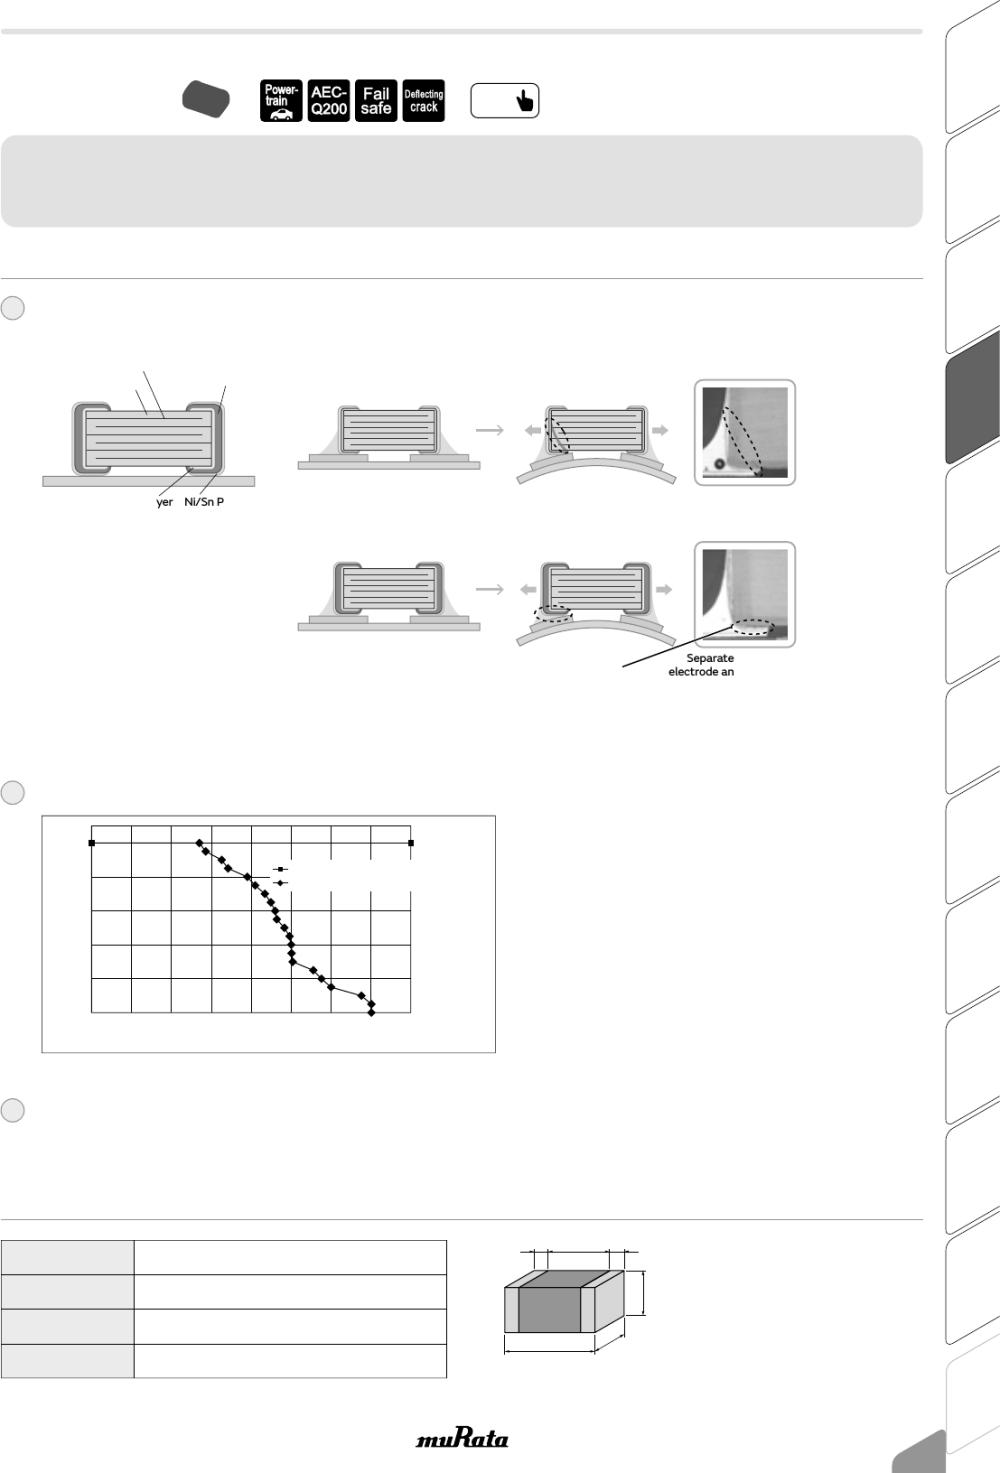 medium resolution of grt seriesgcm seriesgc3 seriesgcd seriesgce seriesgcg series gcj serieskcm serieskc3 serieskca series nmf series